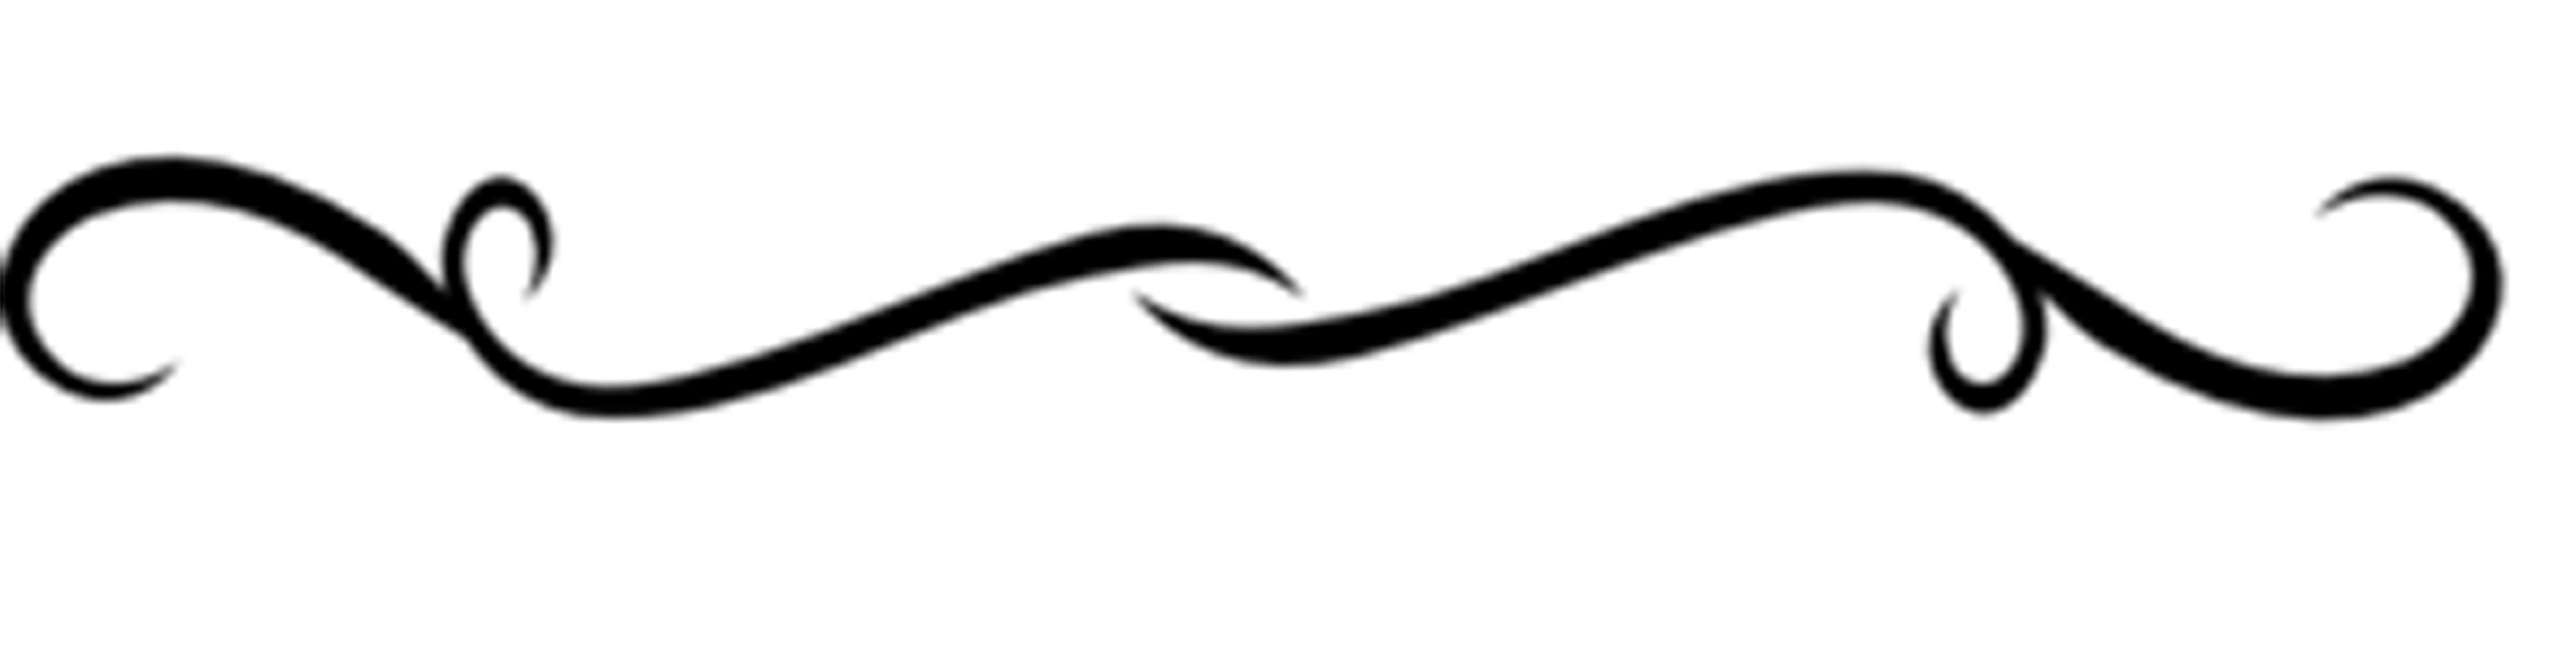 black-swirl-divider